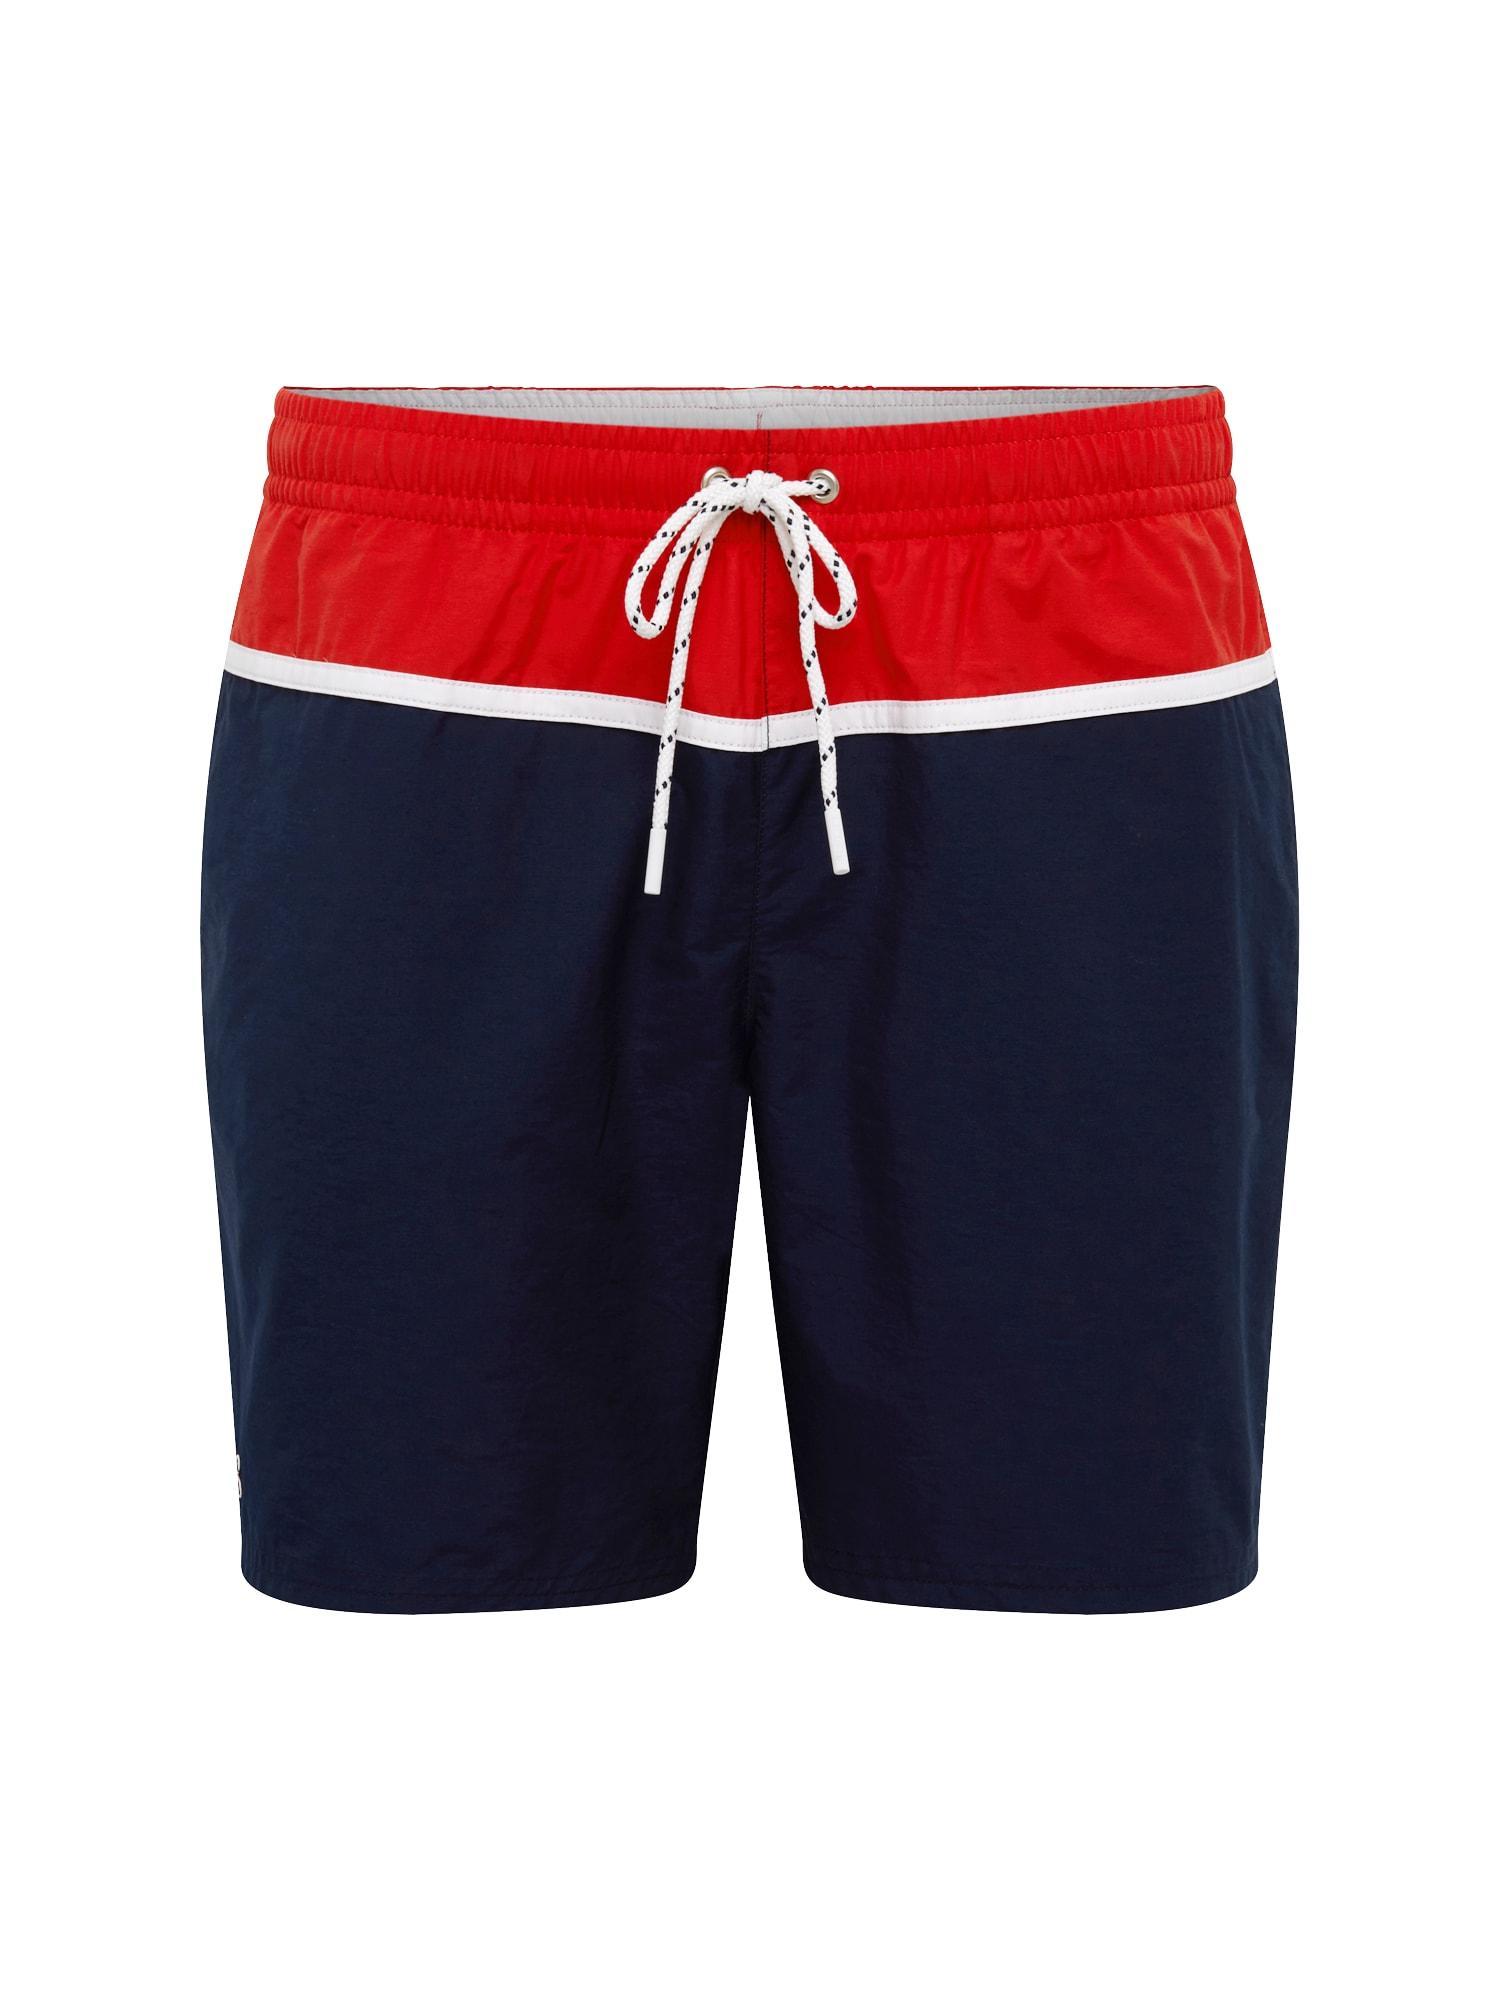 Plavecké šortky MAILLOT DE BAIN marine mischfarben LACOSTE